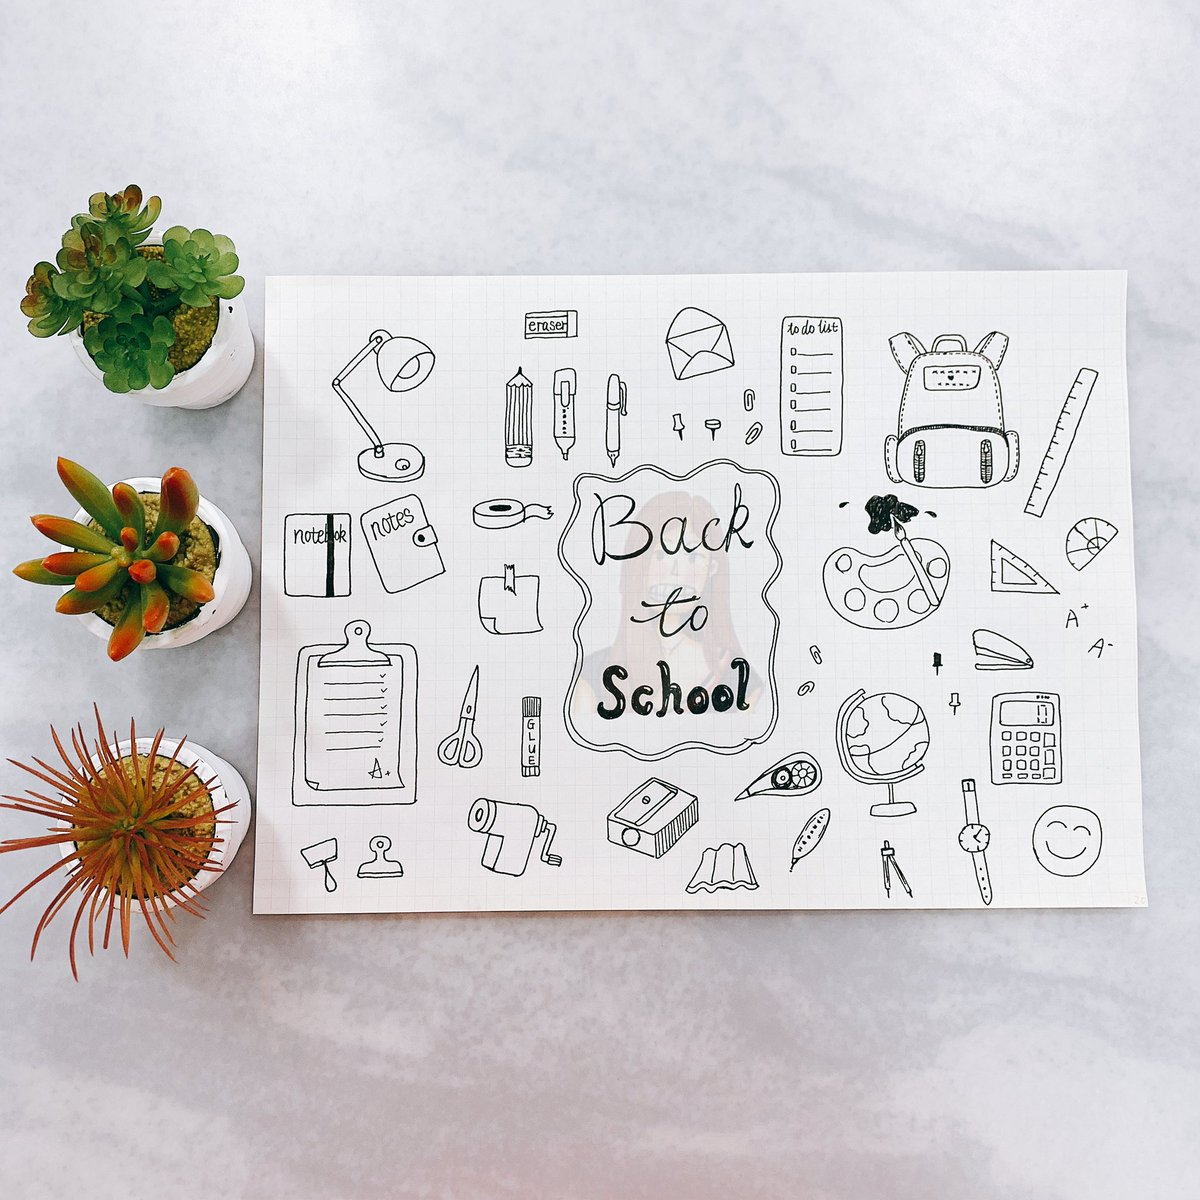 Back to School Subjects Doodle Ideas. YouTube:https://youtu.be/mJ0J7tG477Y  #doodle #doodles #DoodleAndChat #bulletjournal #bulletjounals #bujo #artbujo #art #painting #paintings #drawing #drawings #illustrationart #backtoschool #stayhome #StayHomeStaySafe #stayhomestayactivepic.twitter.com/sO2c8mQR9Z